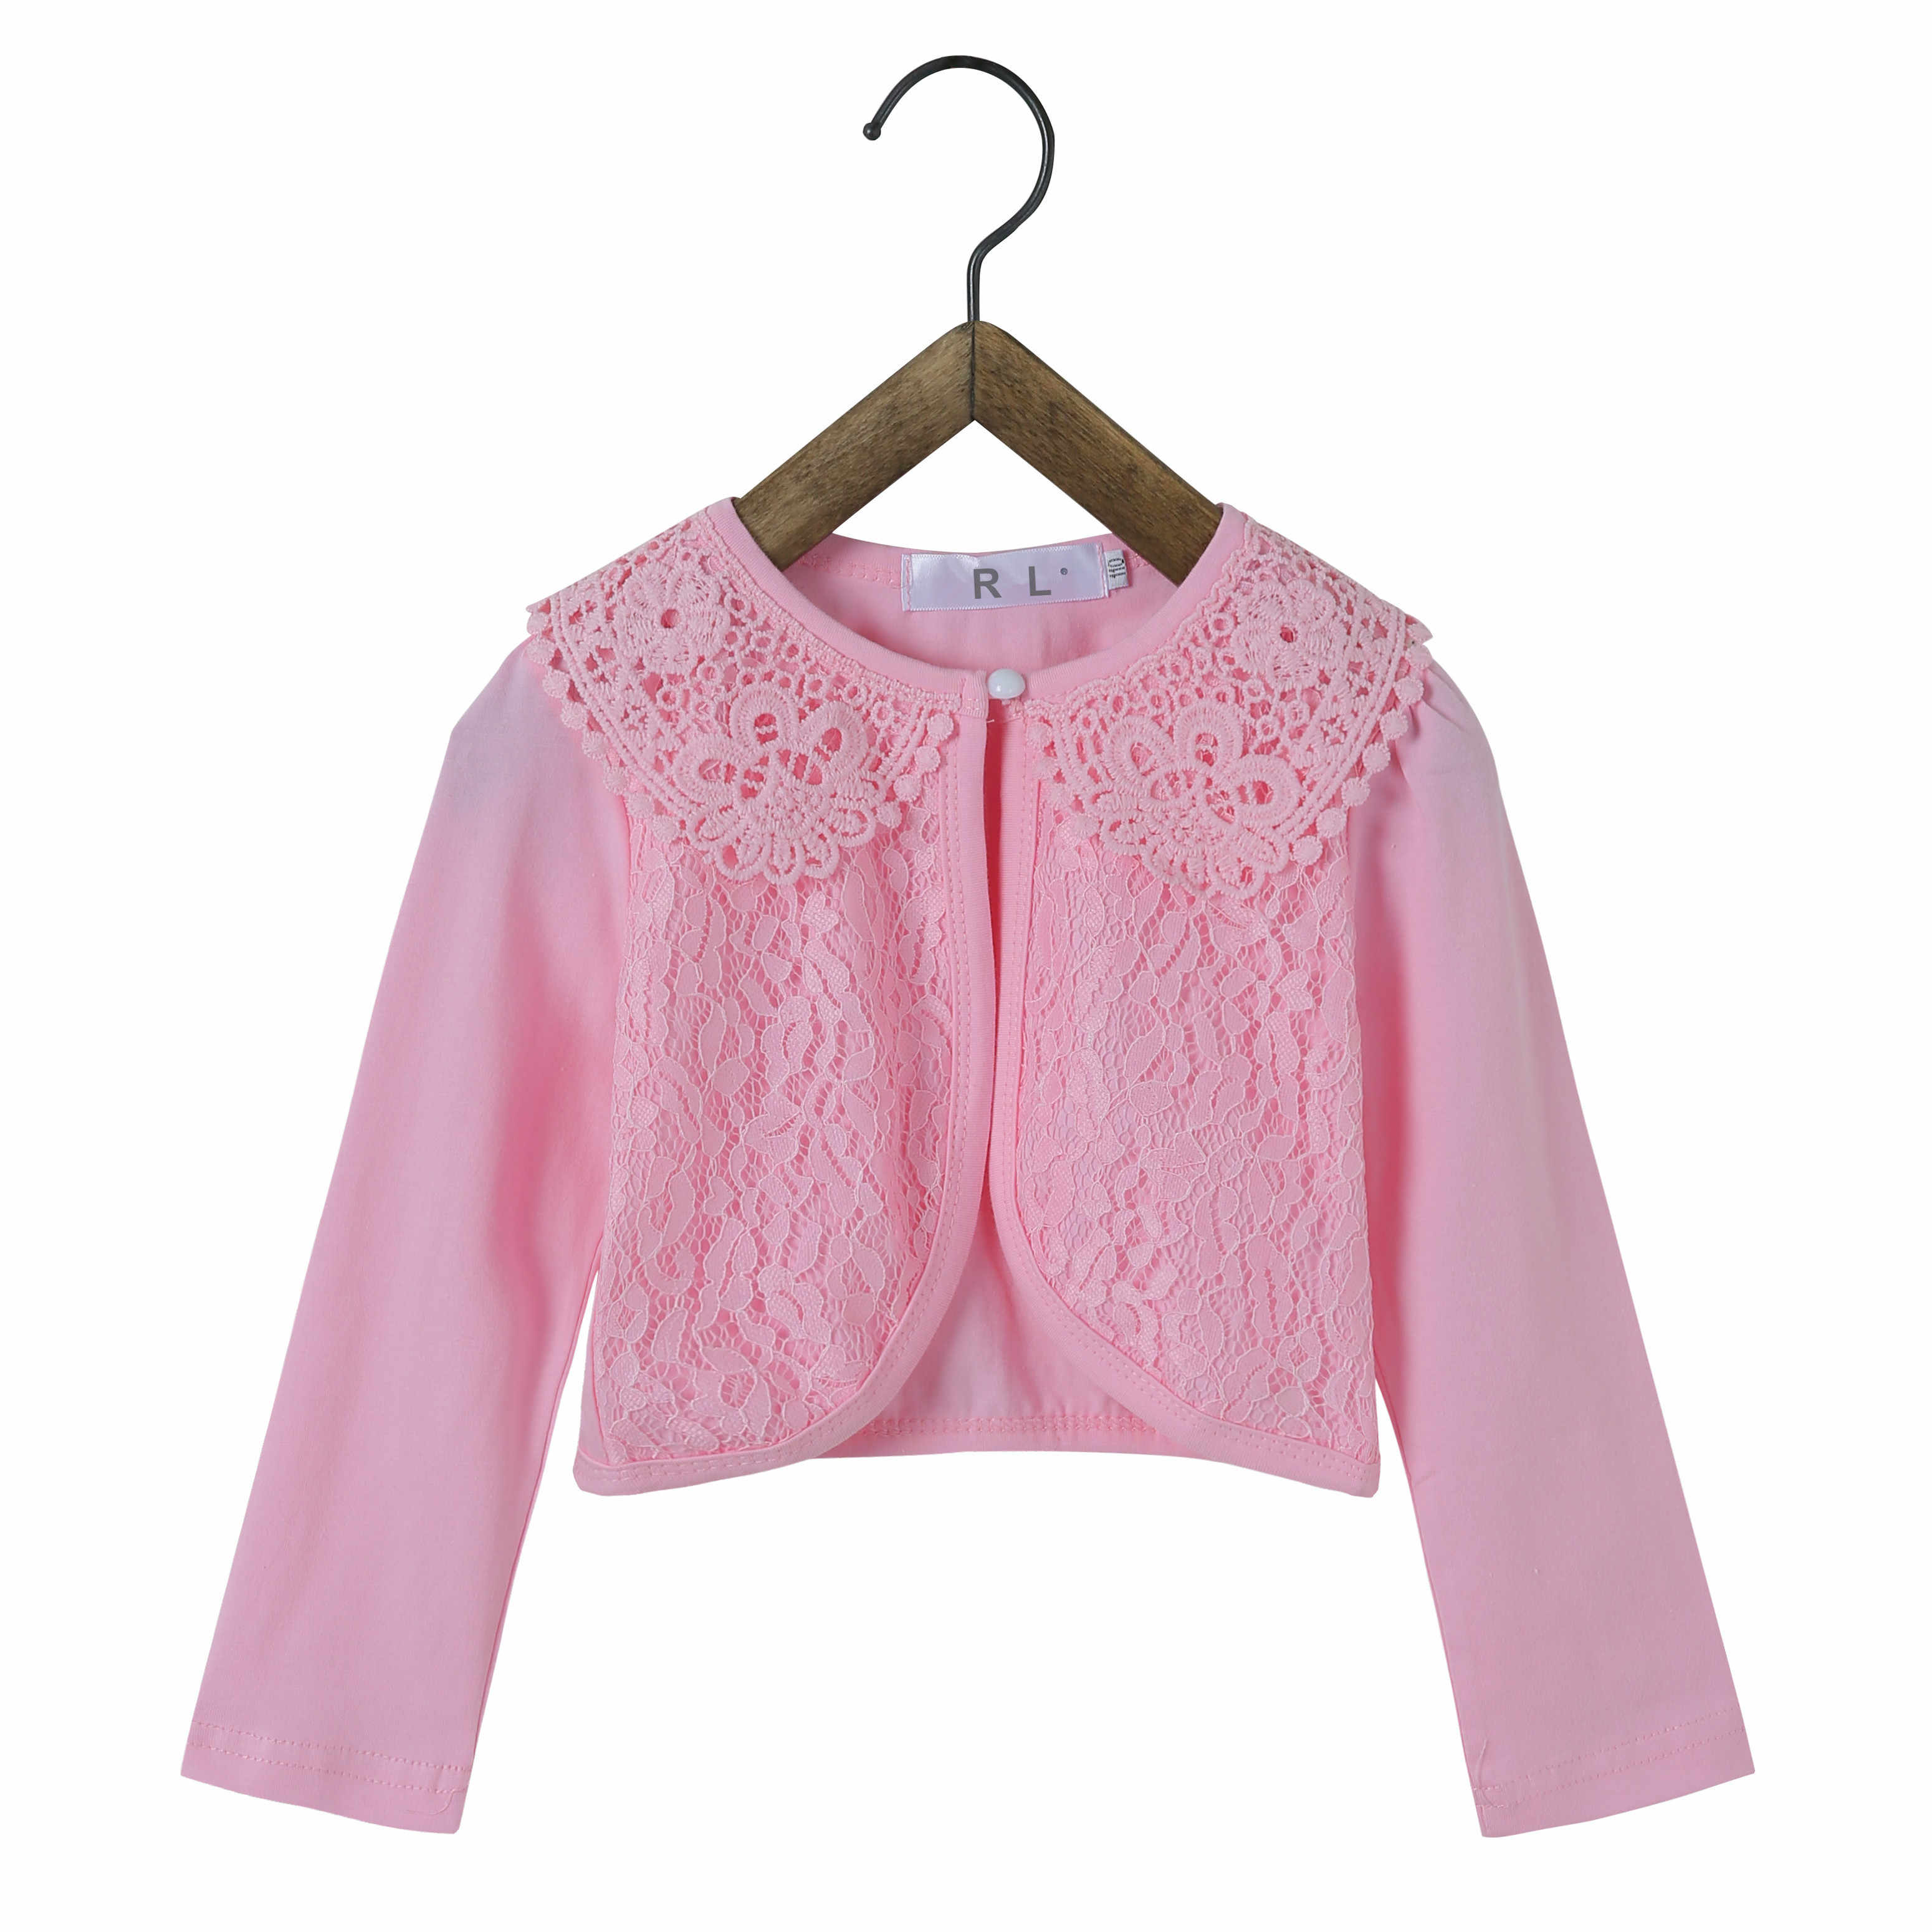 61a023808b047 RL Kids Cardigan Sweater Girls Princess Party Wear Girls Jacket Coat  Children Shrug 2019 Kids Clothing for 1-12 Years Old